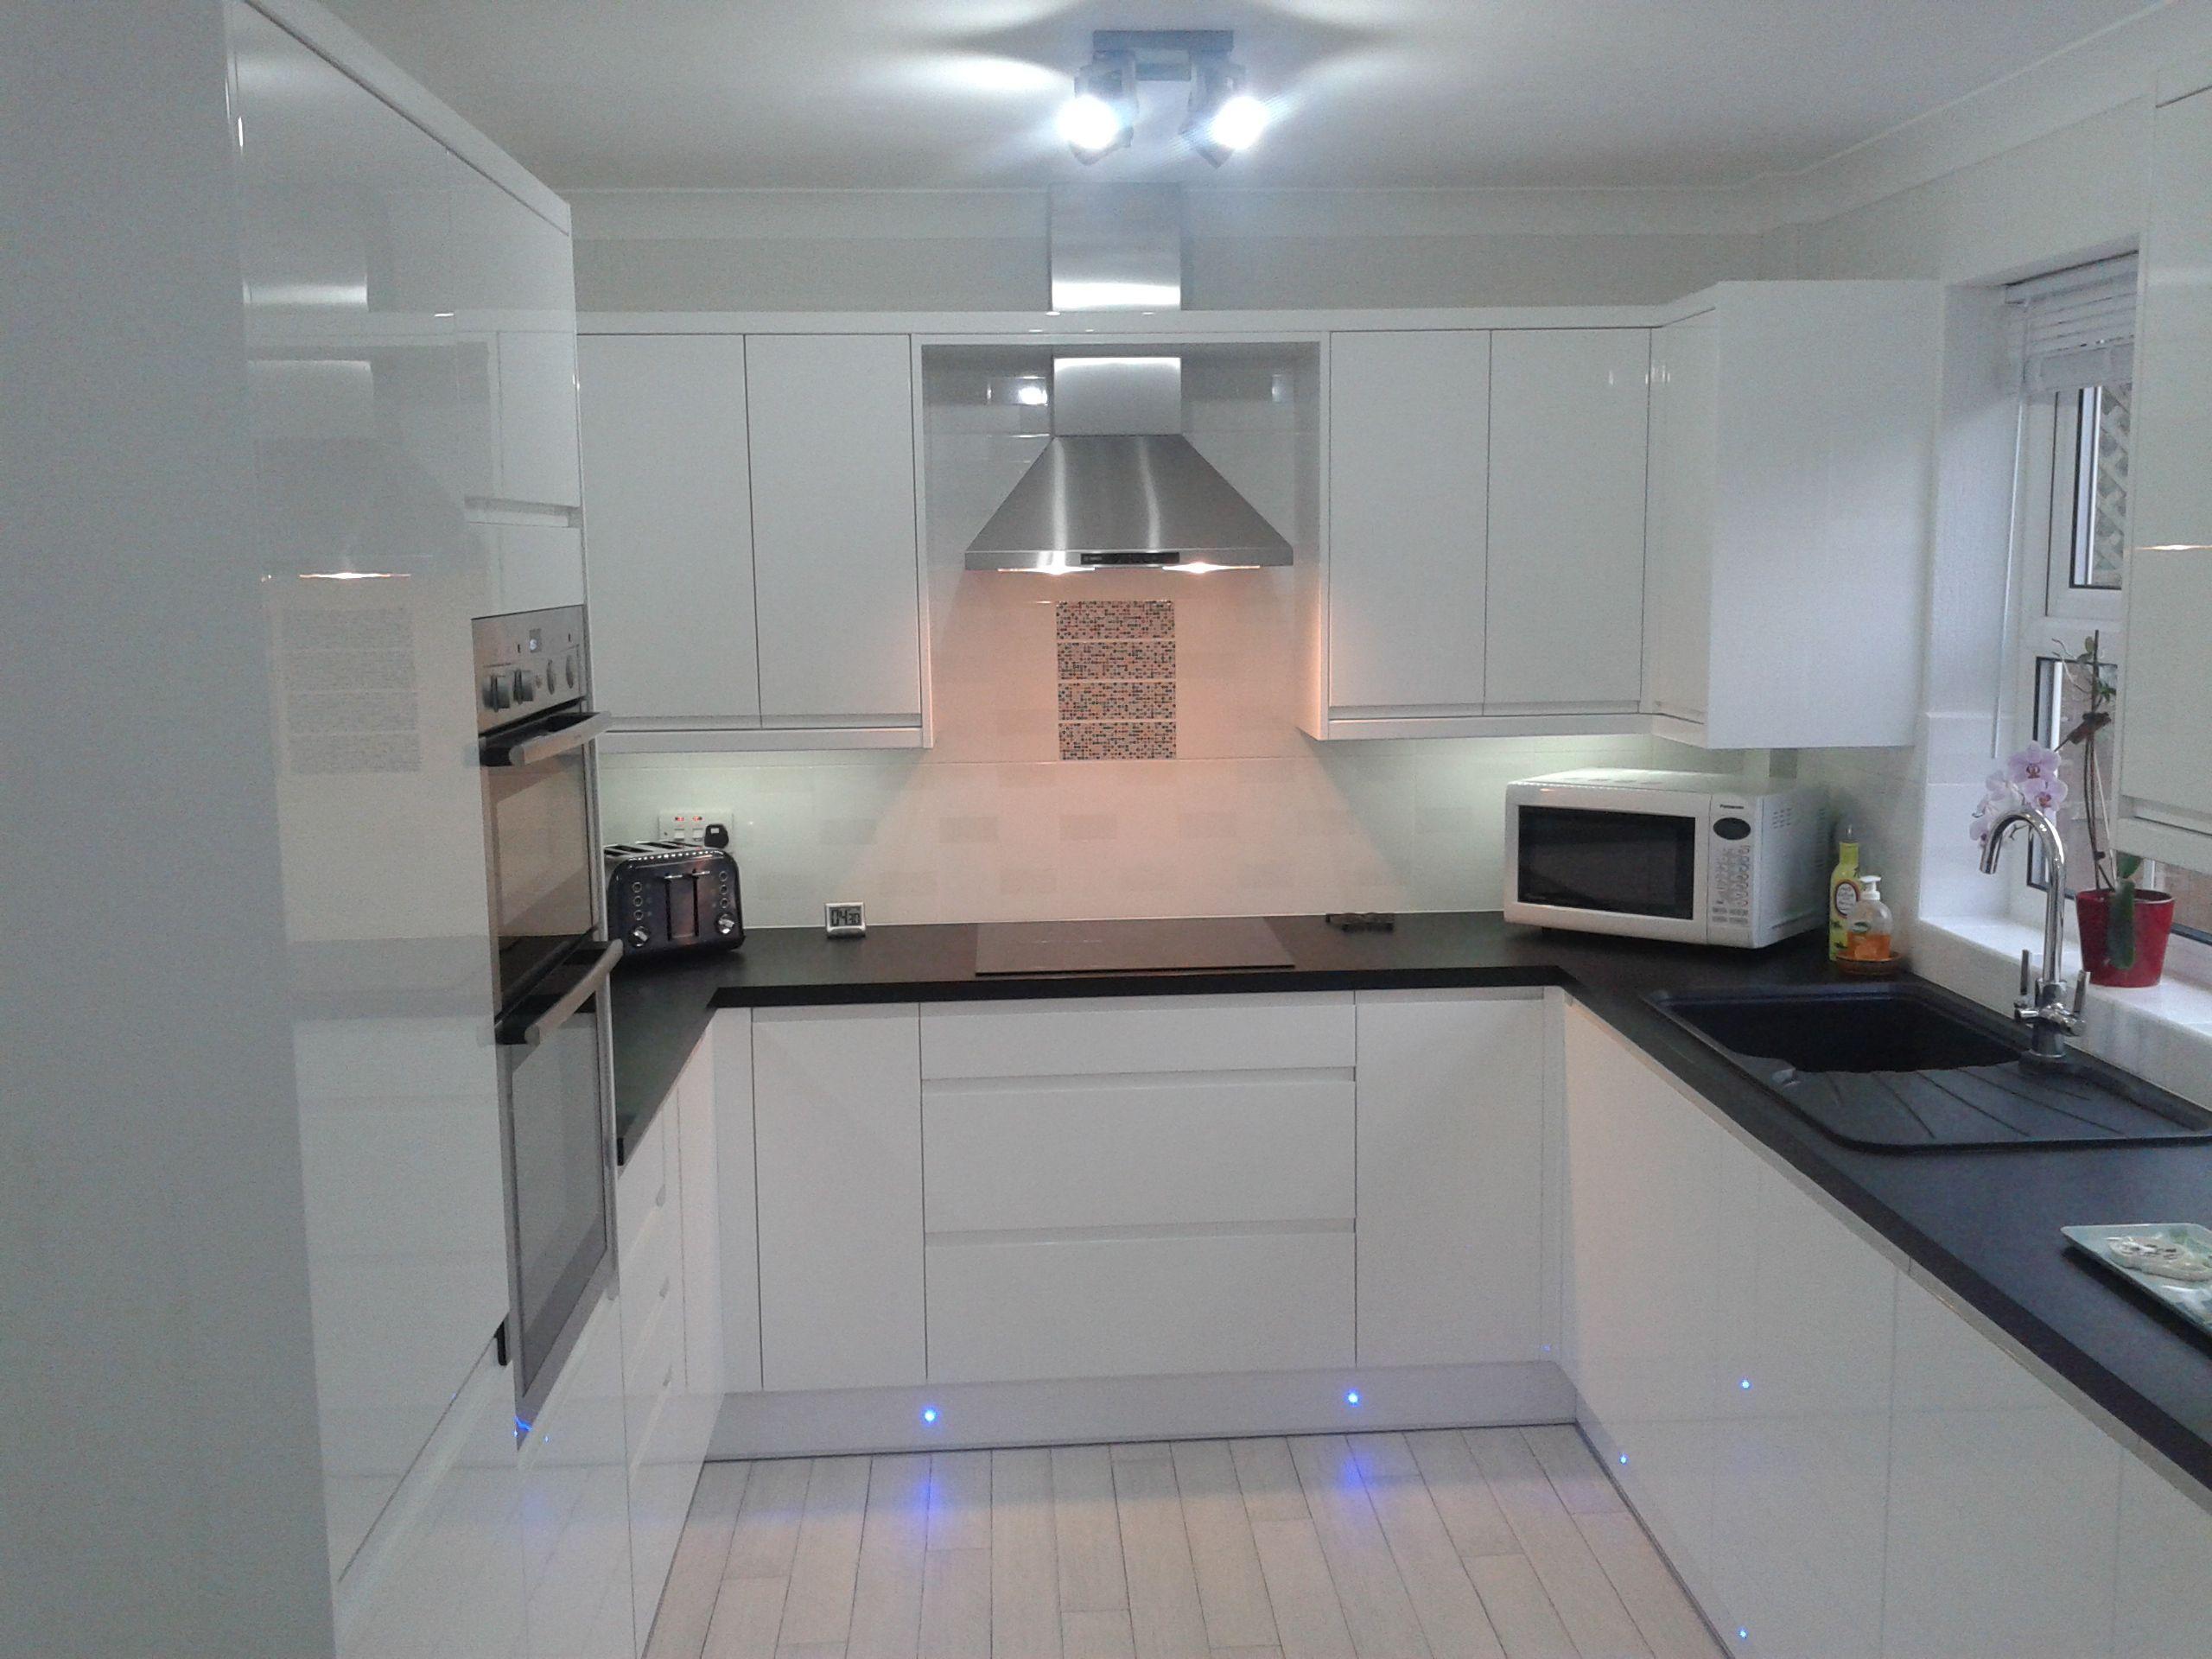 Best Wren Kitchen Bar Stools 9 For Your Interior Designing Home ...